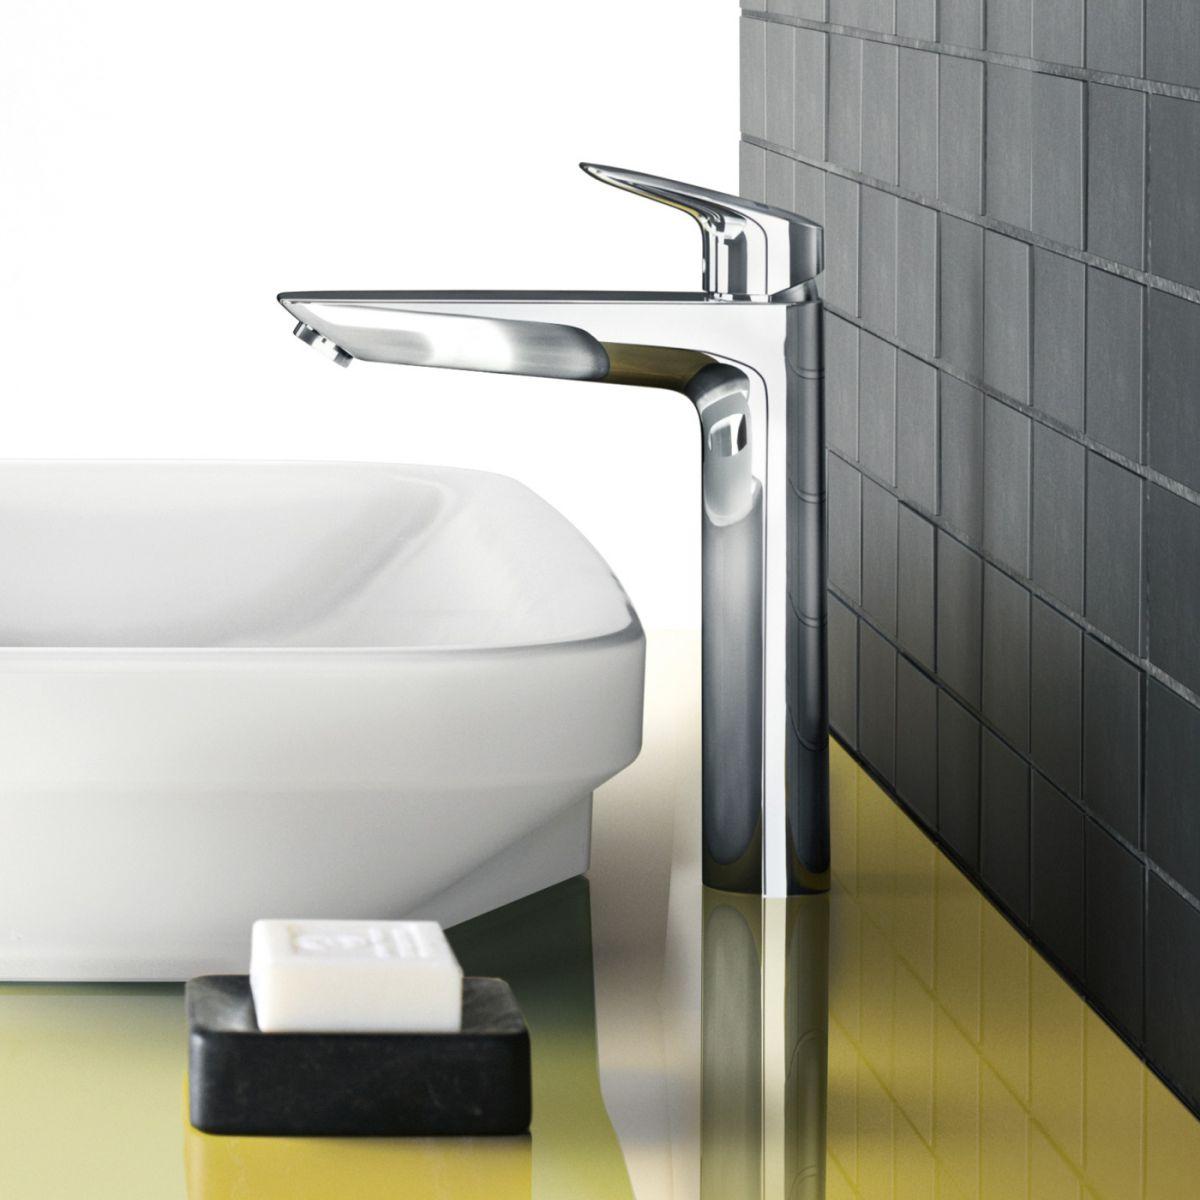 hansgrohe logis 190 tall basin mixer tap uk bathrooms. Black Bedroom Furniture Sets. Home Design Ideas